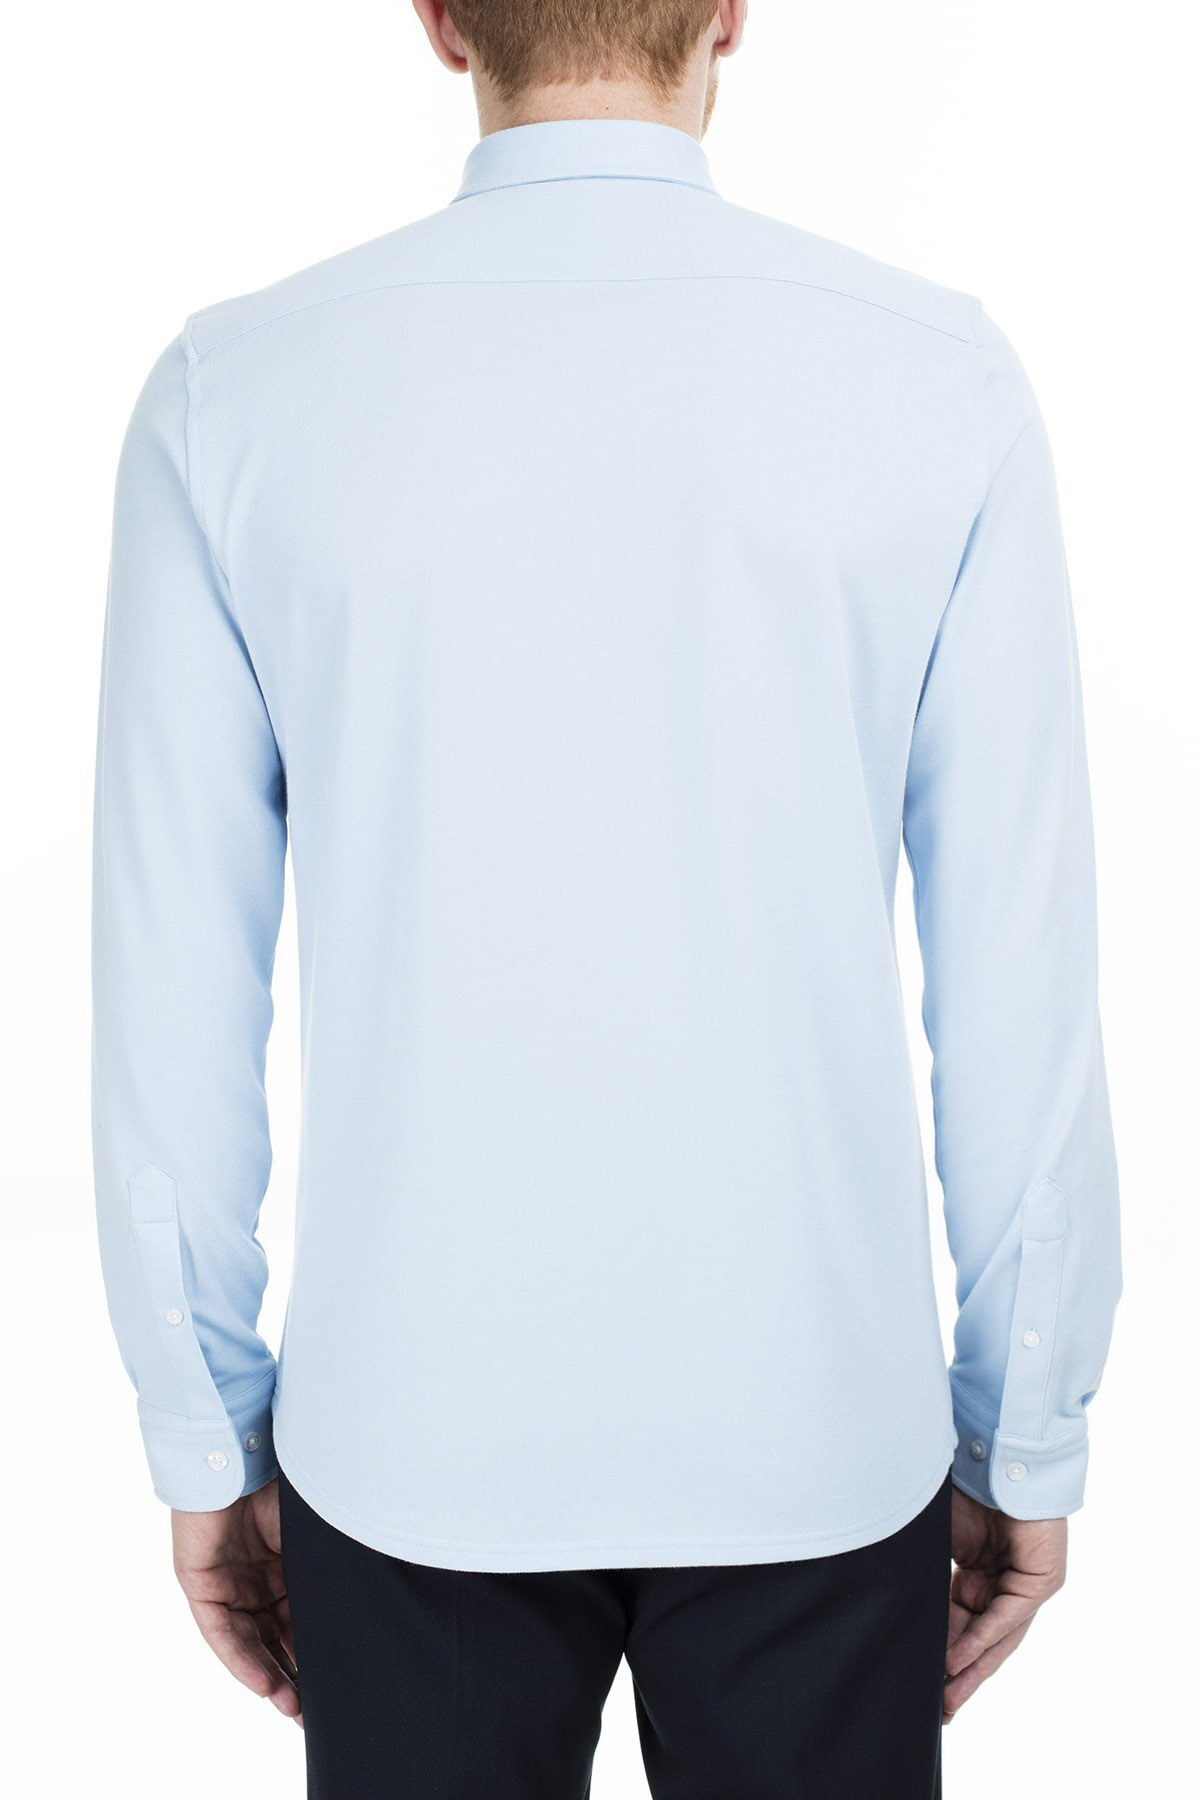 Lacoste Slim Fit Erkek Gömlek CH0953 53M AÇIK MAVİ